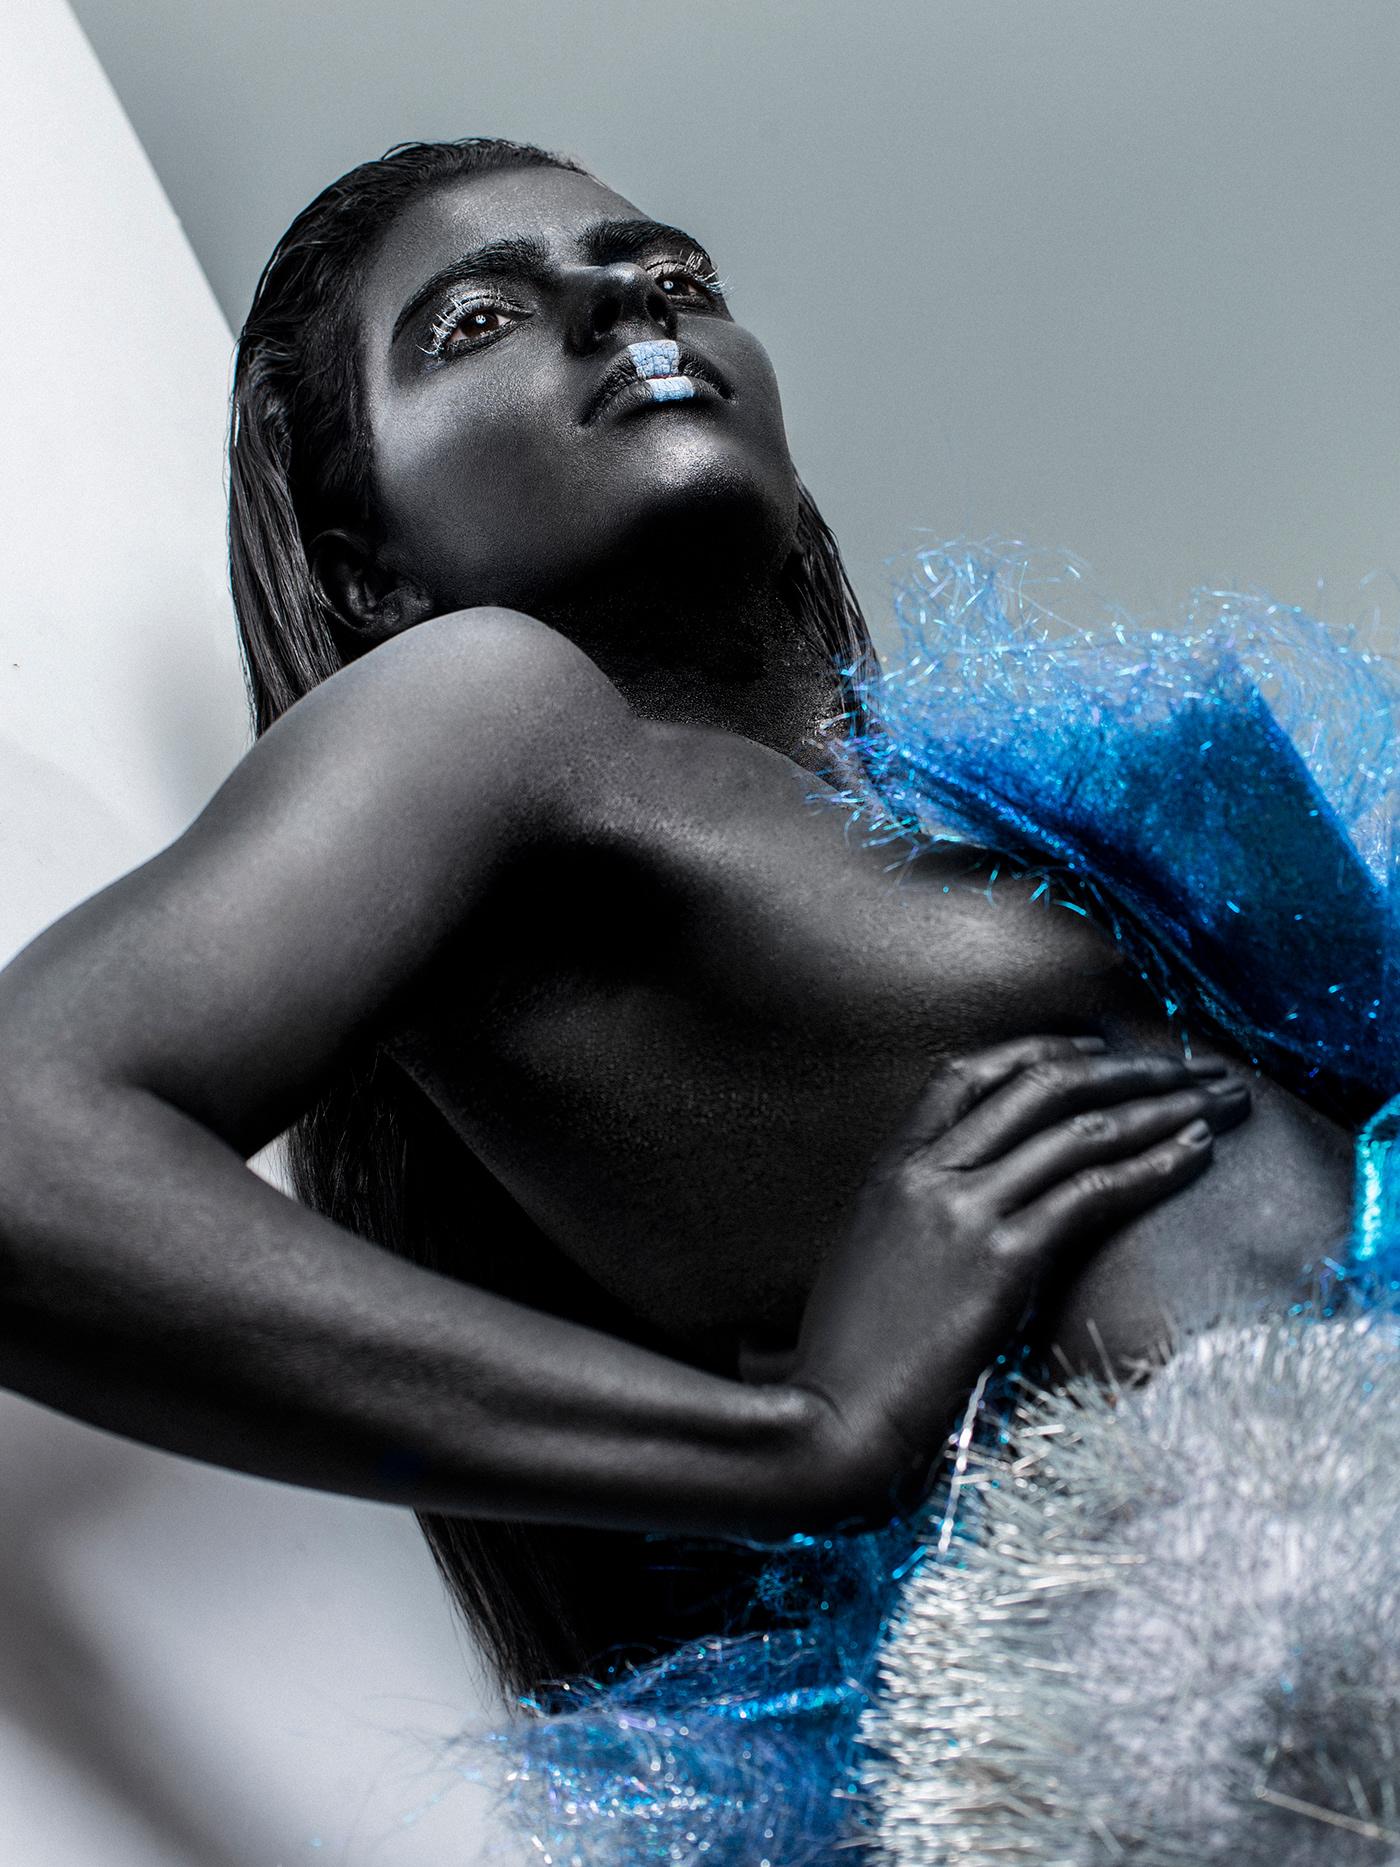 Fashion  Style editorial Photography  dark profoto Elinchrom studio makeup design